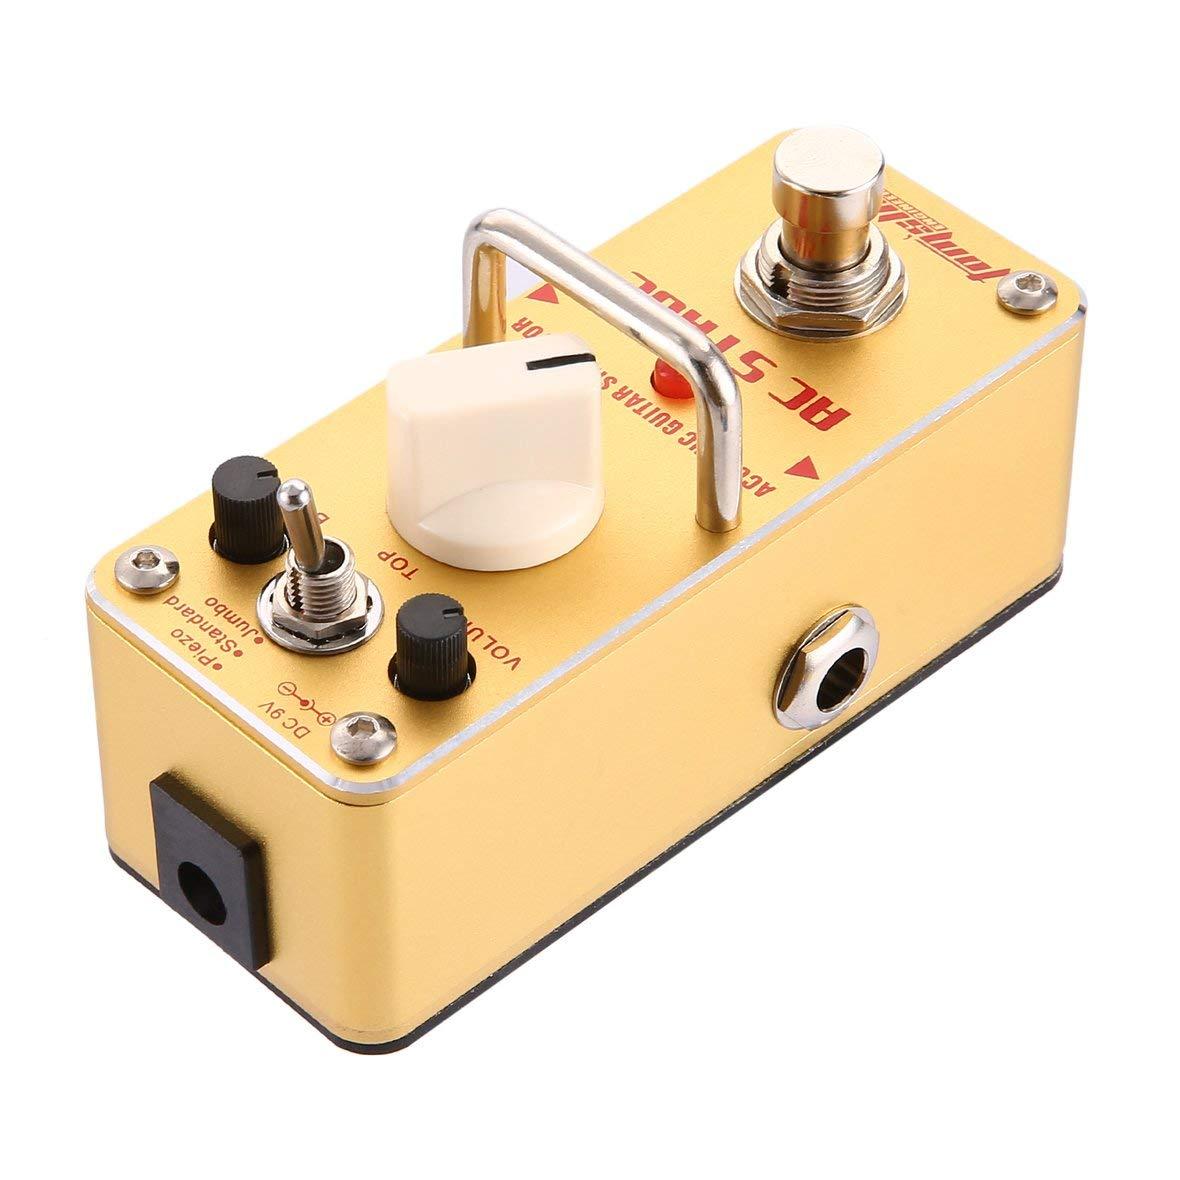 Heaviesk para Aroma AAS-3 AC Stage Simulador de Guitarra acústica Mini Pedal de Efecto de Guitarra eléctrica con True Bypass Accesorios para Guitarra: ...